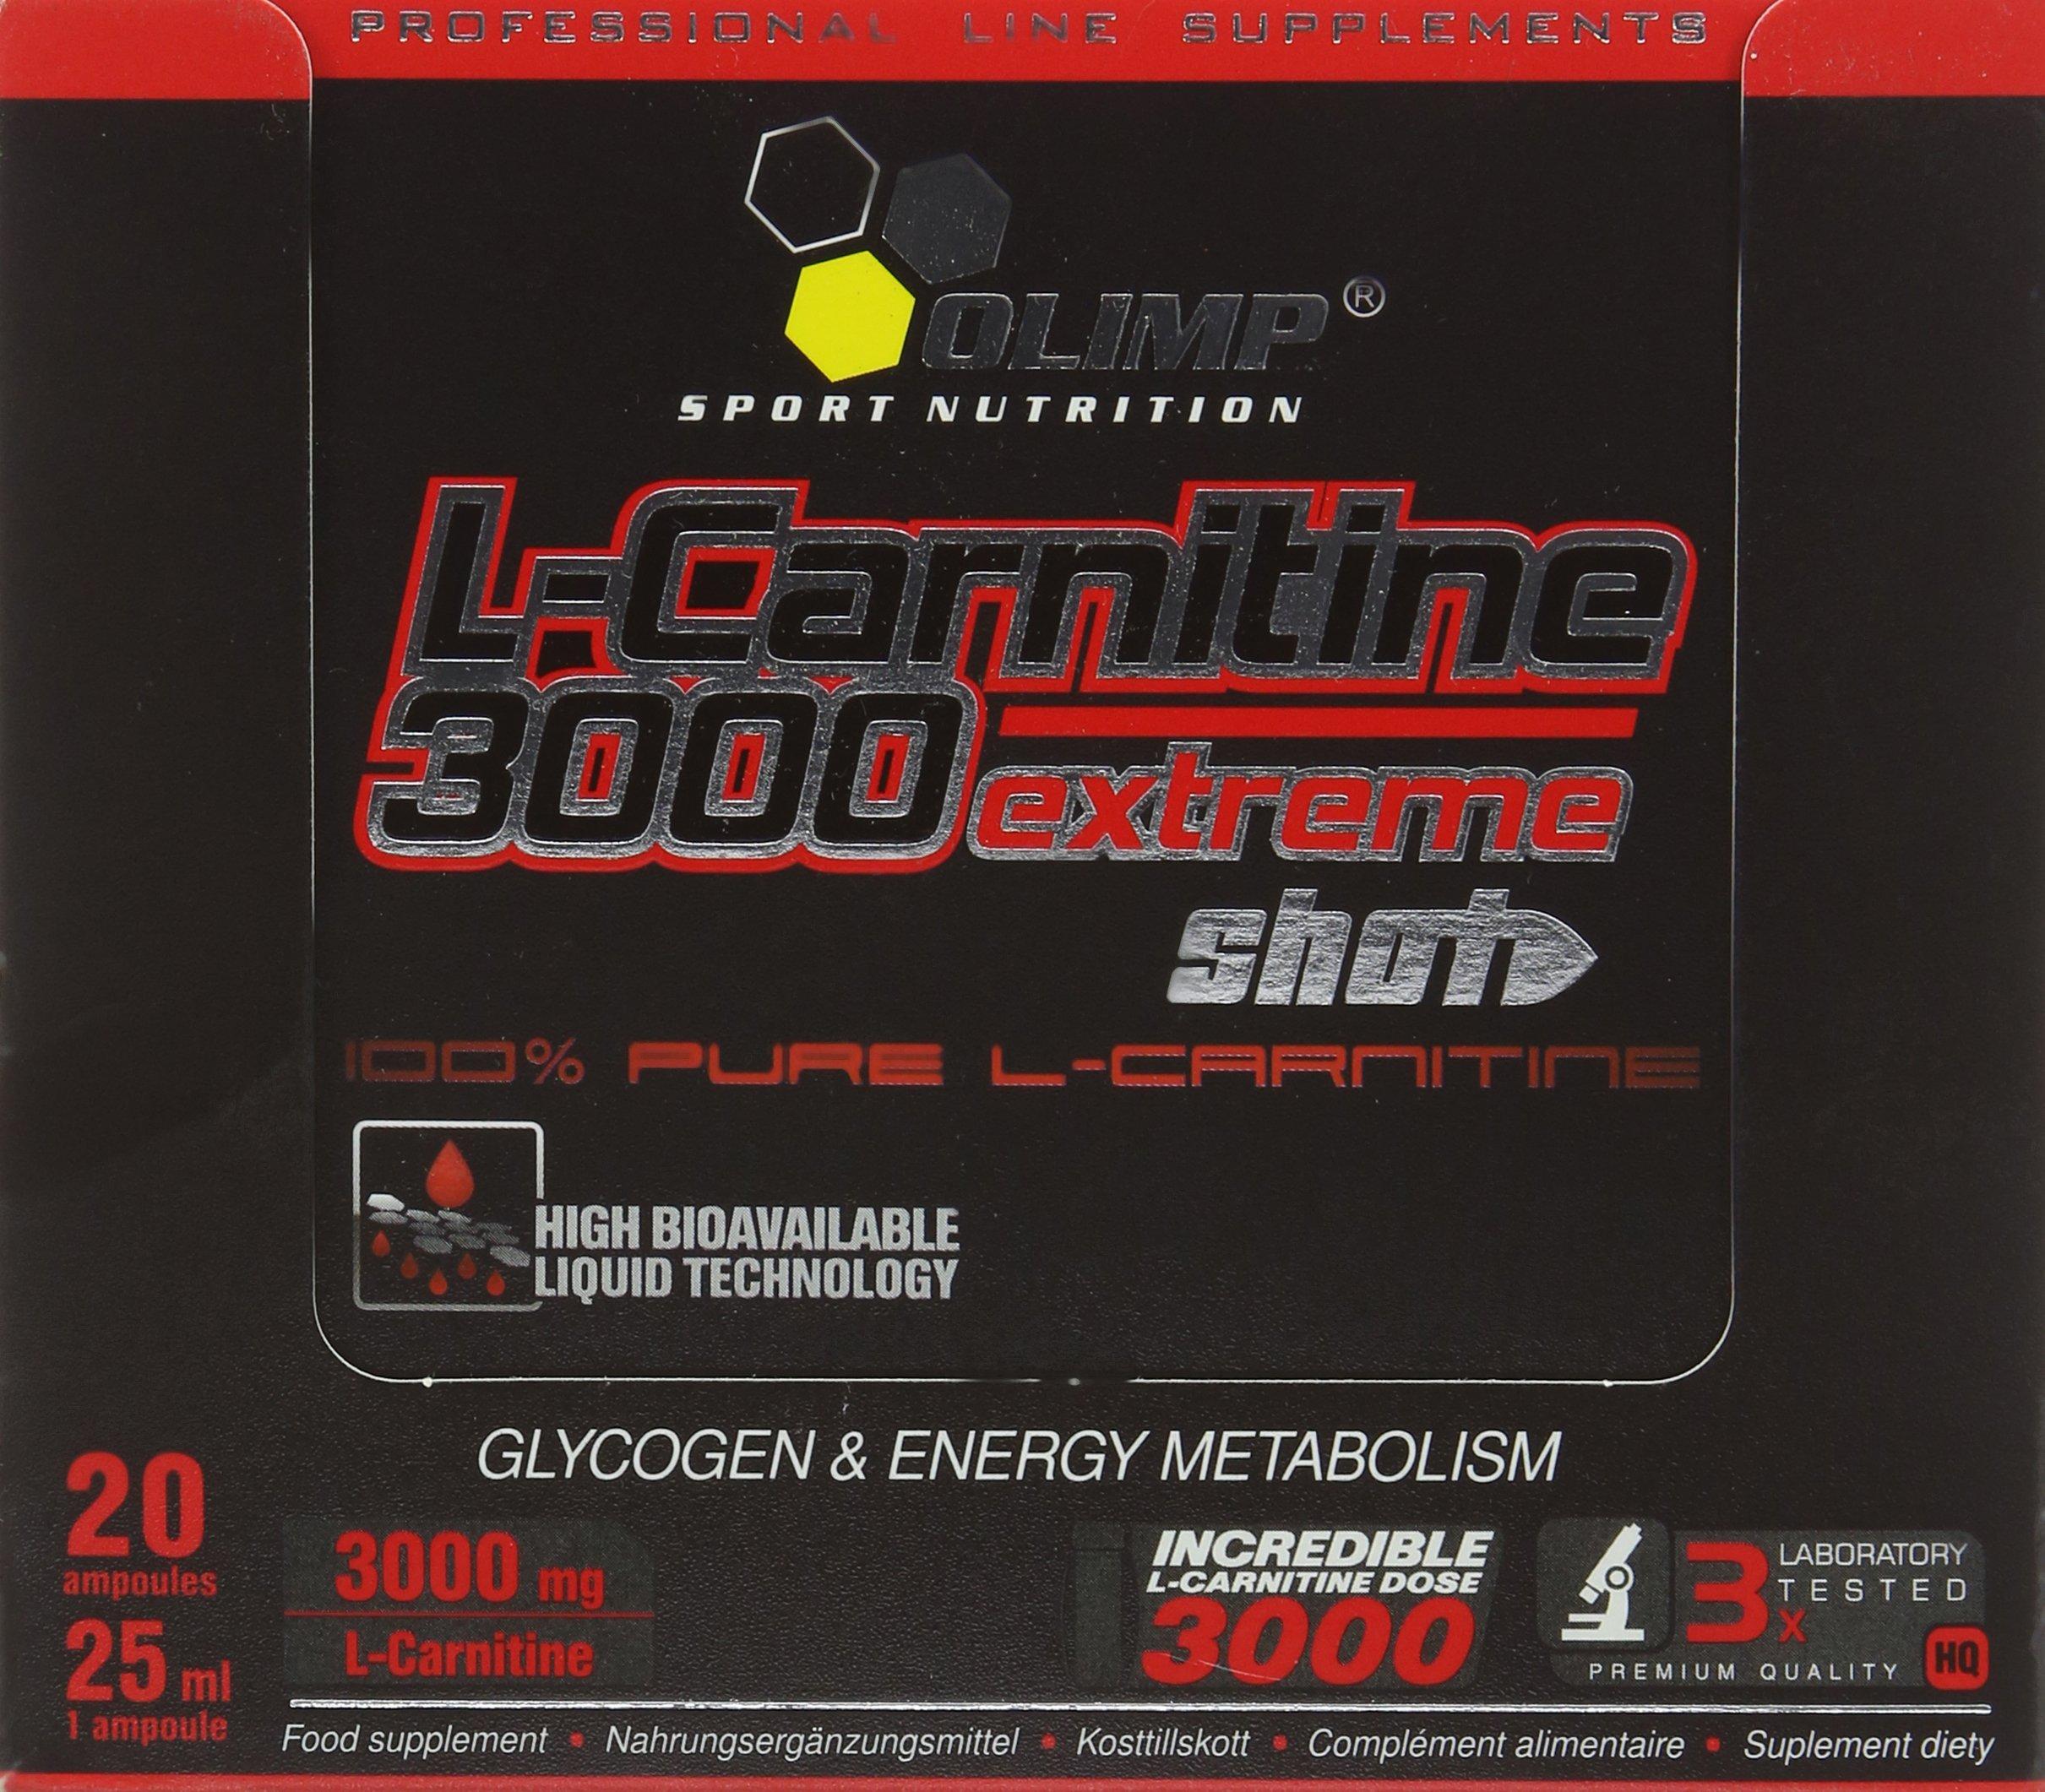 91JtfV9OcGL - Olimp Orange 25ml L-Carnitine Forte 3000 Extreme Shot - Pack of 20 Shots